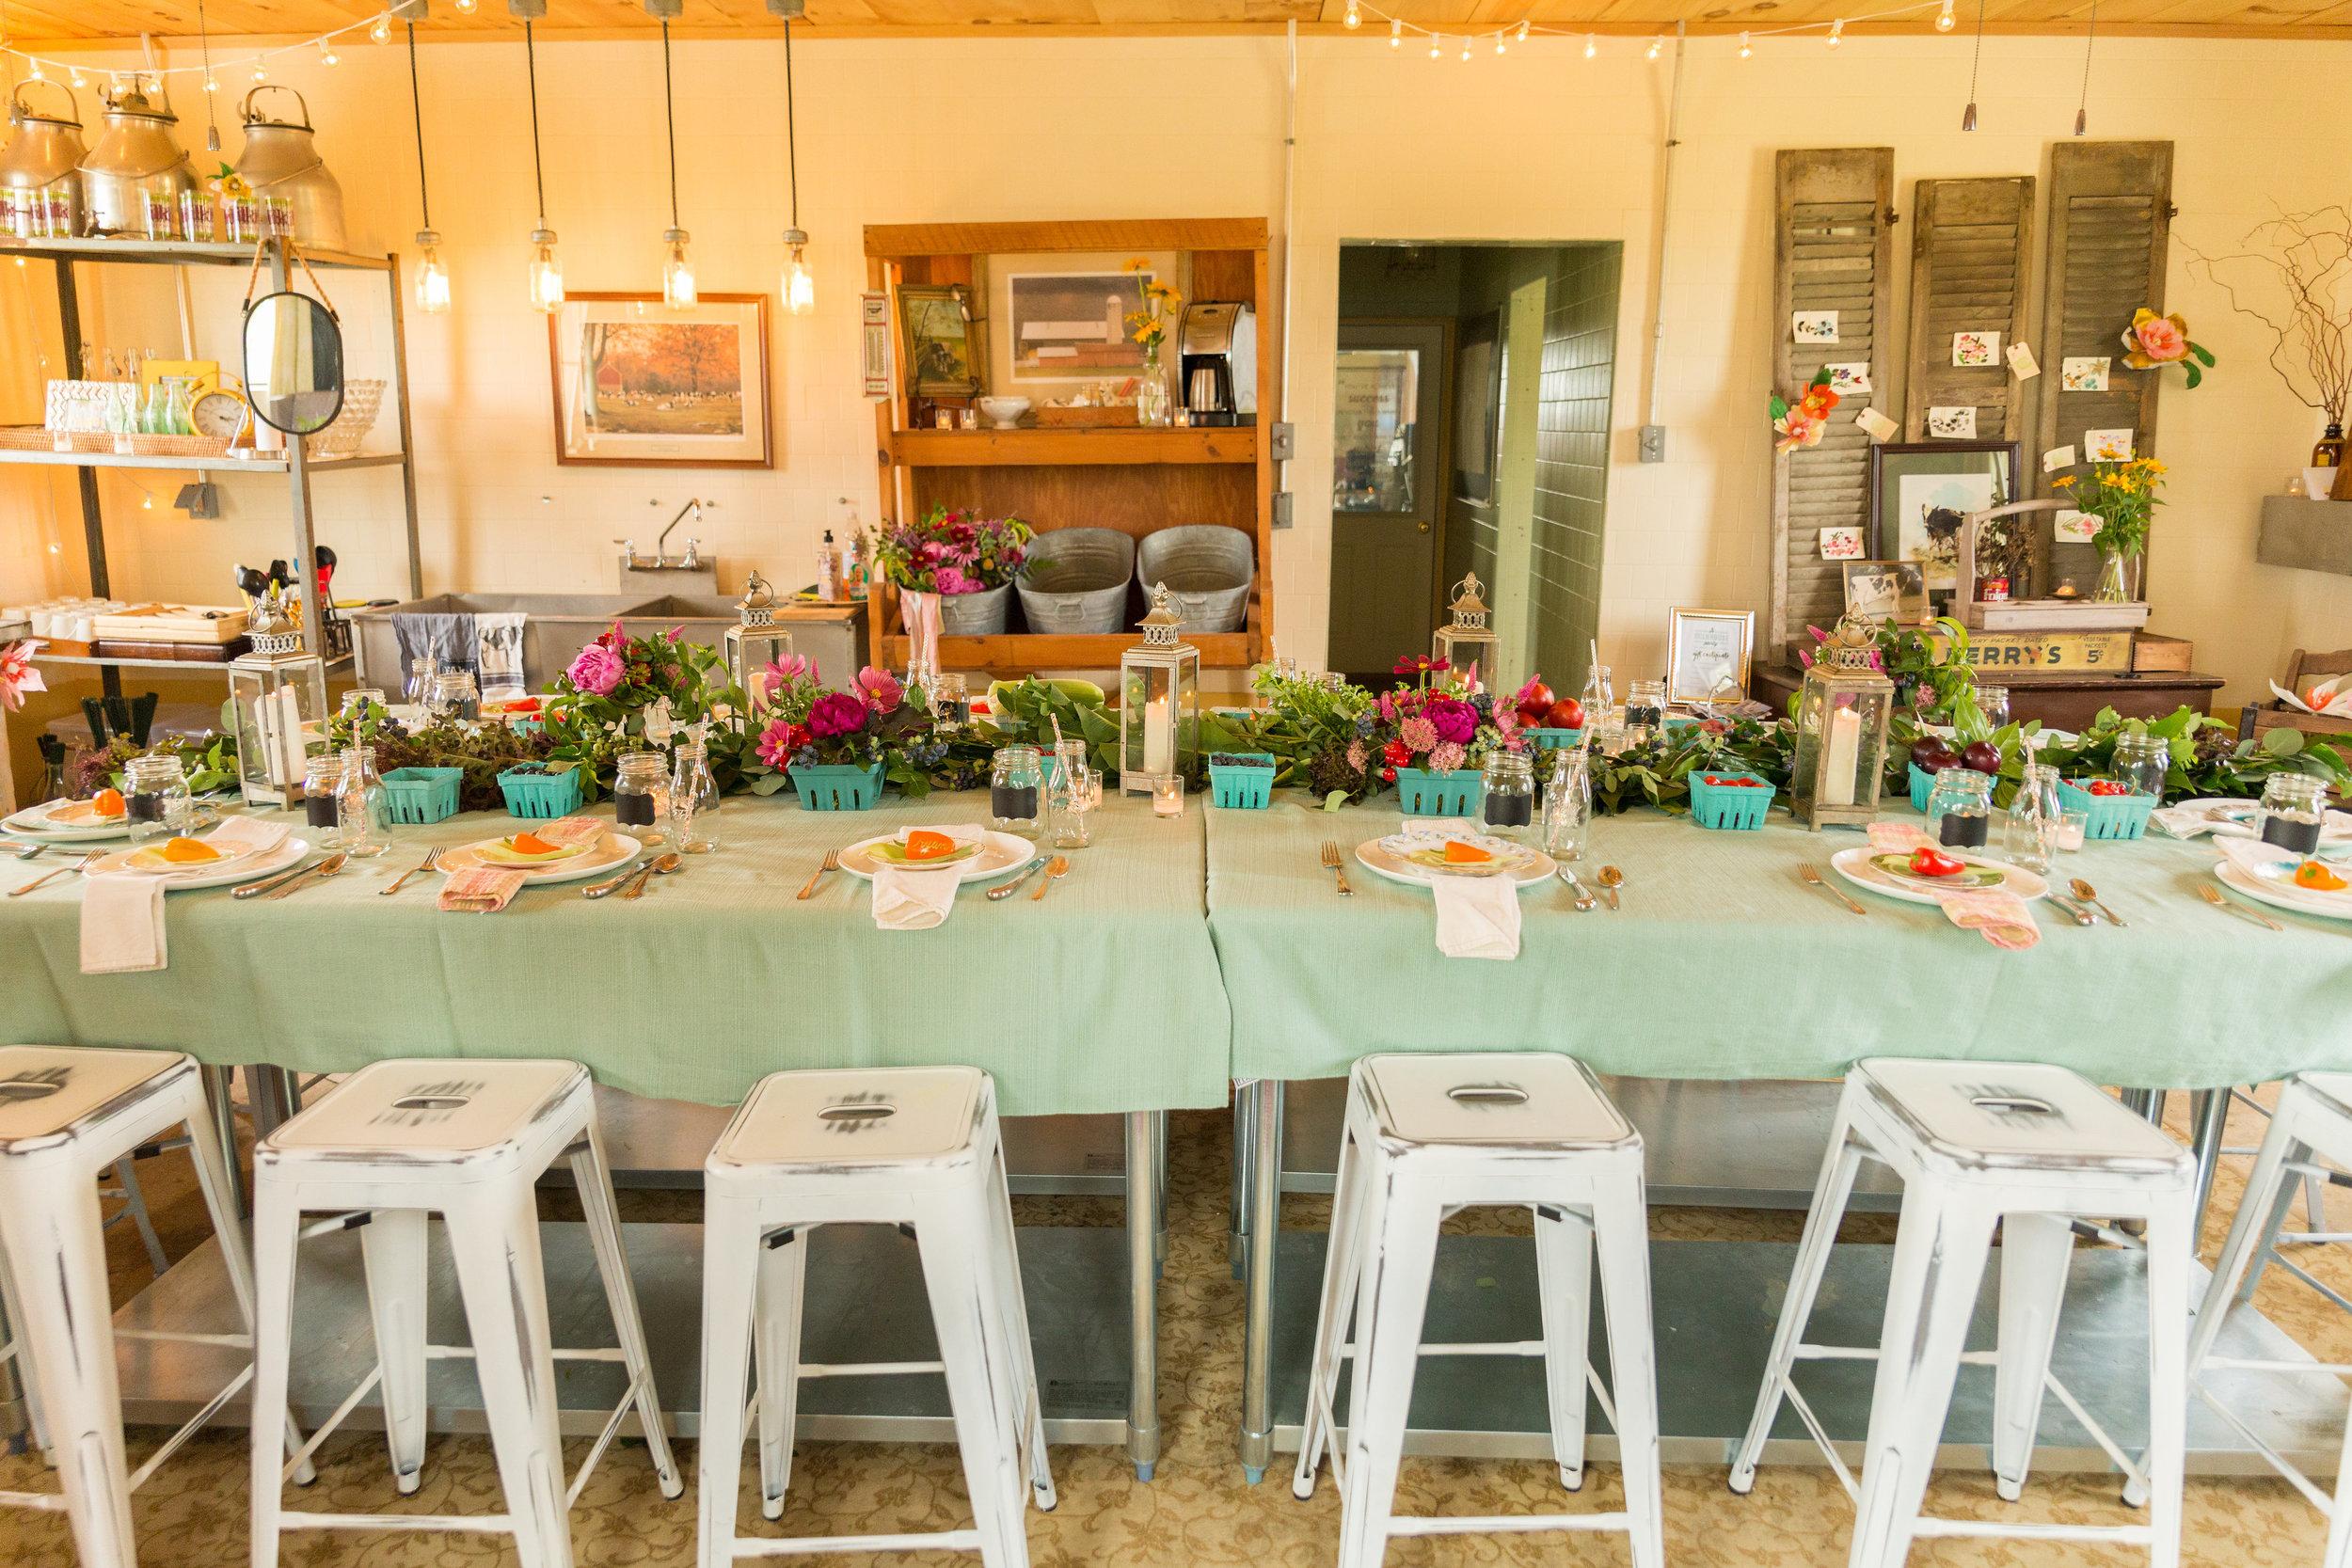 Danielle-Jeff-Farm-to-table-wedding-photography-love-story-studios-0030.jpg